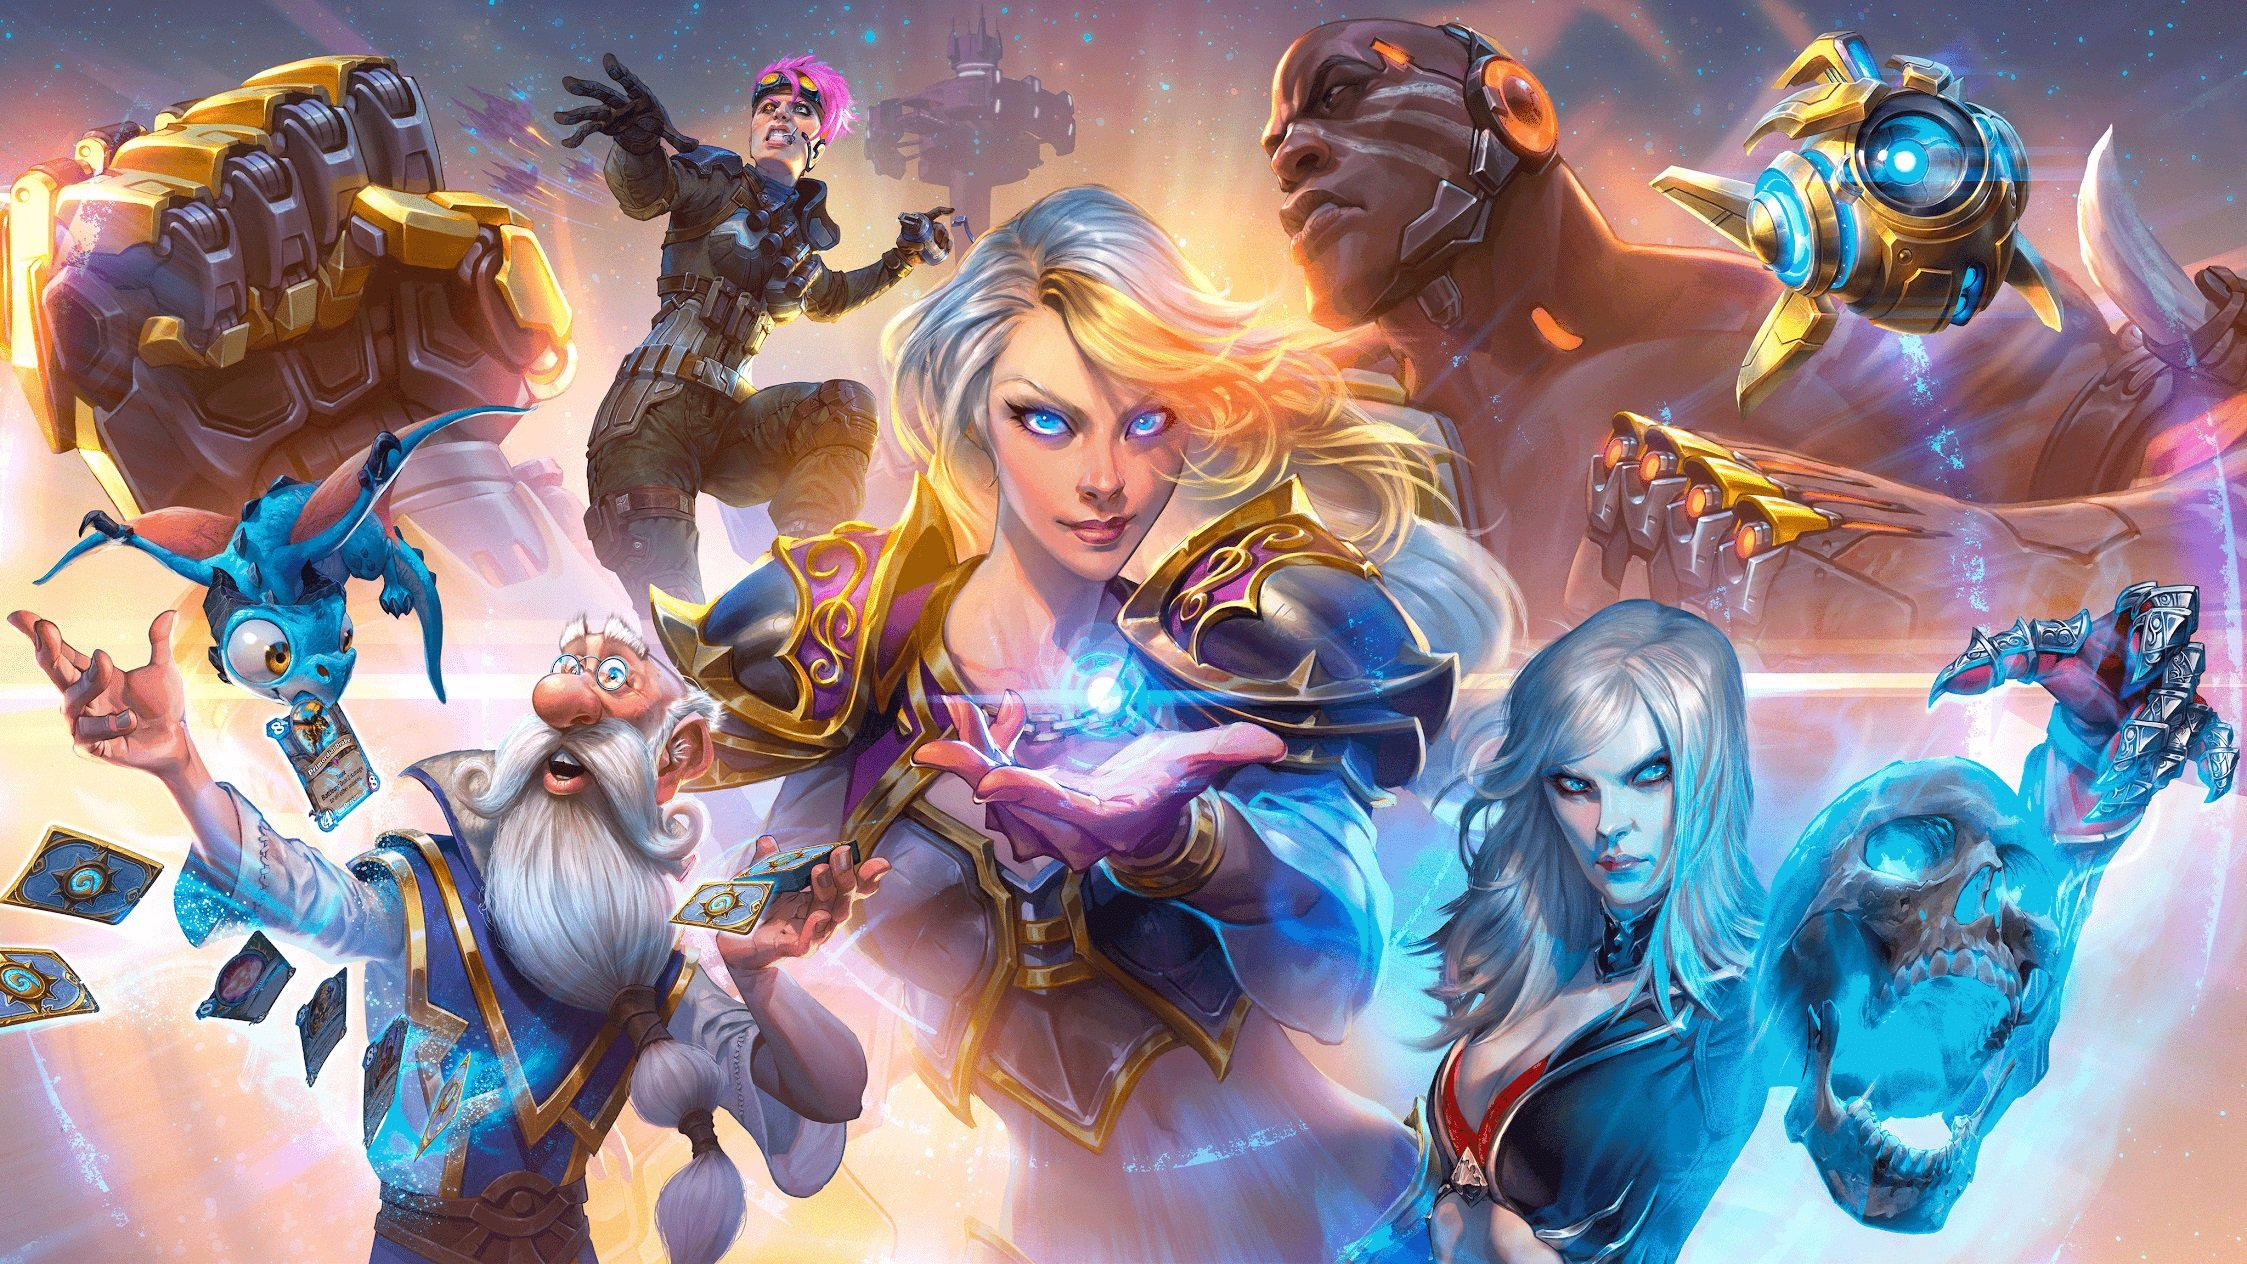 Blizzard to release more mobile games in the future | AllGamers